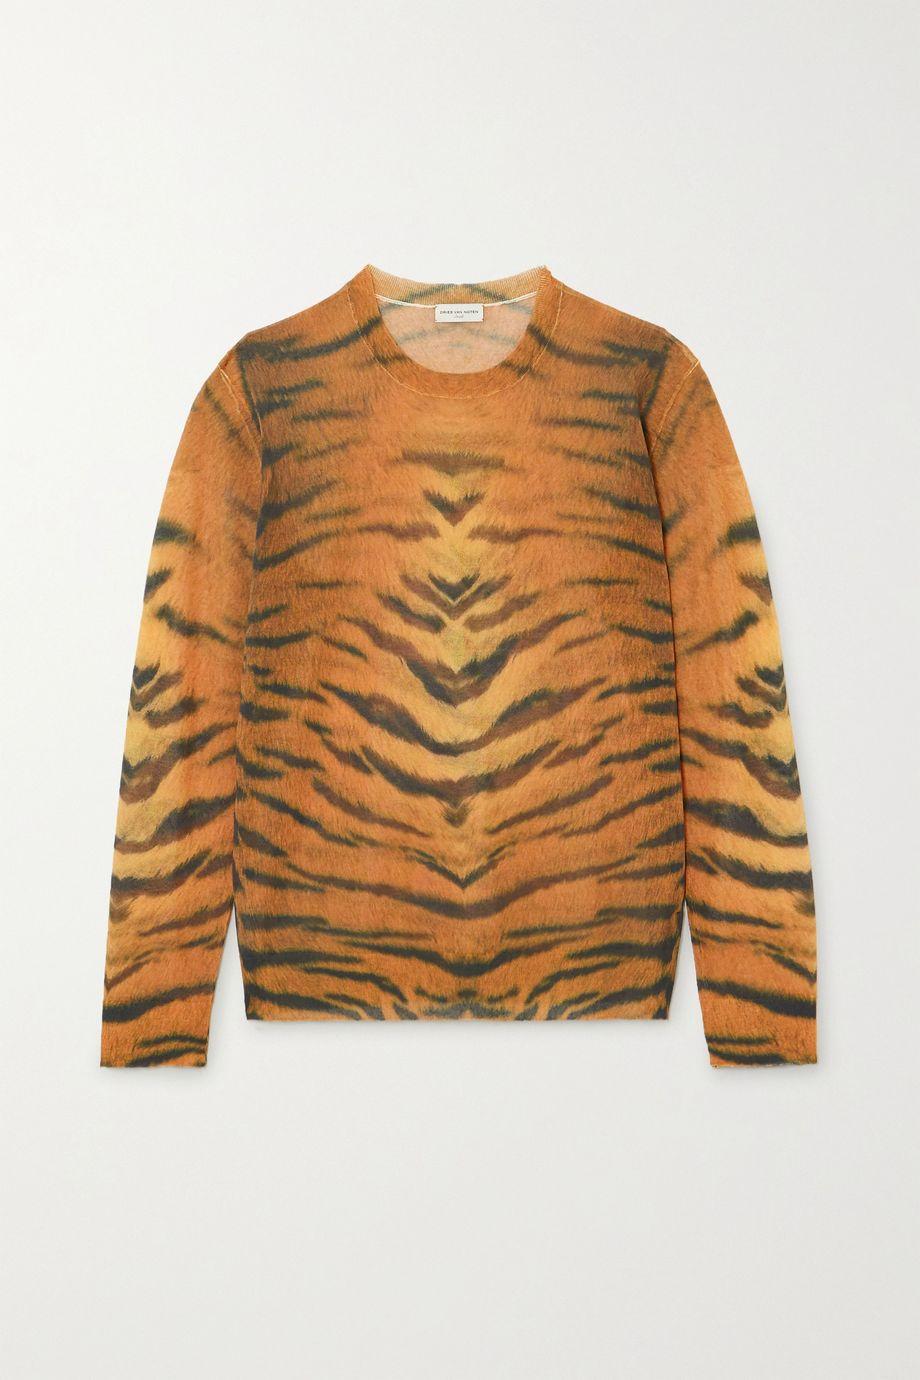 Dries Van Noten Tiger-print cotton-blend sweater